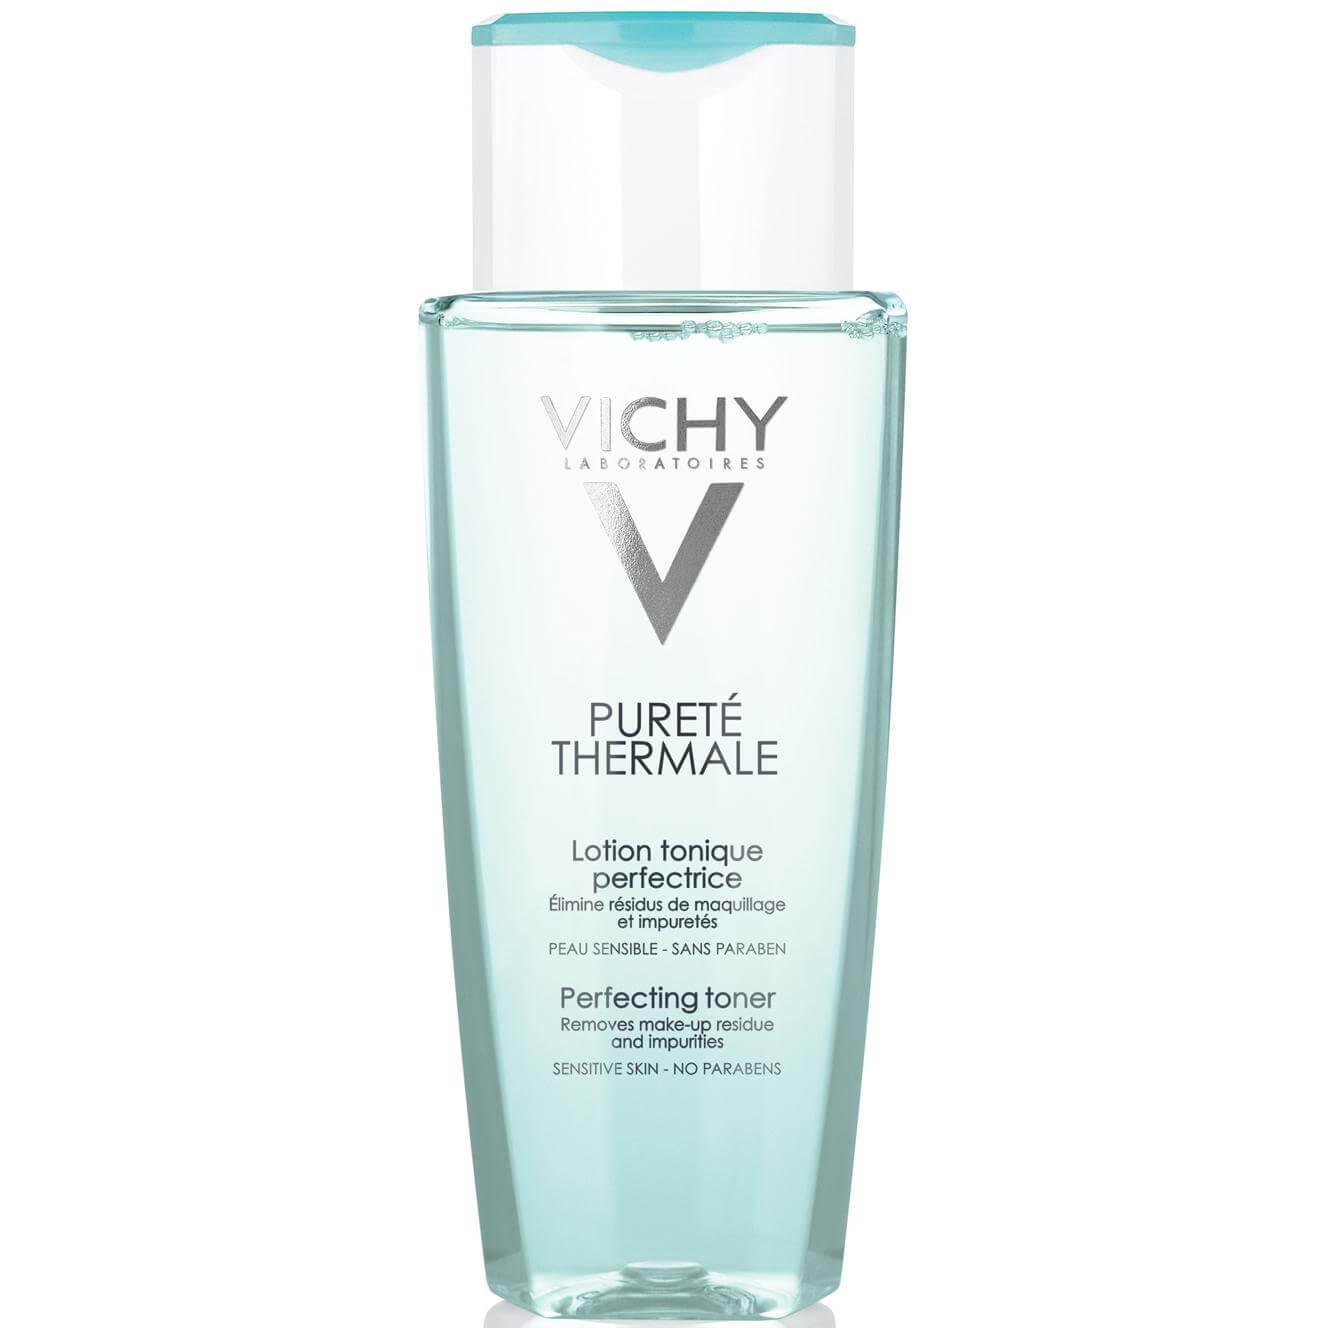 Vichy Purete Thermal Lotion Pnm Τονωτική Λοσιόν Καθαρισμού για Ευαίσθητες Επιδερμίδες 200ml